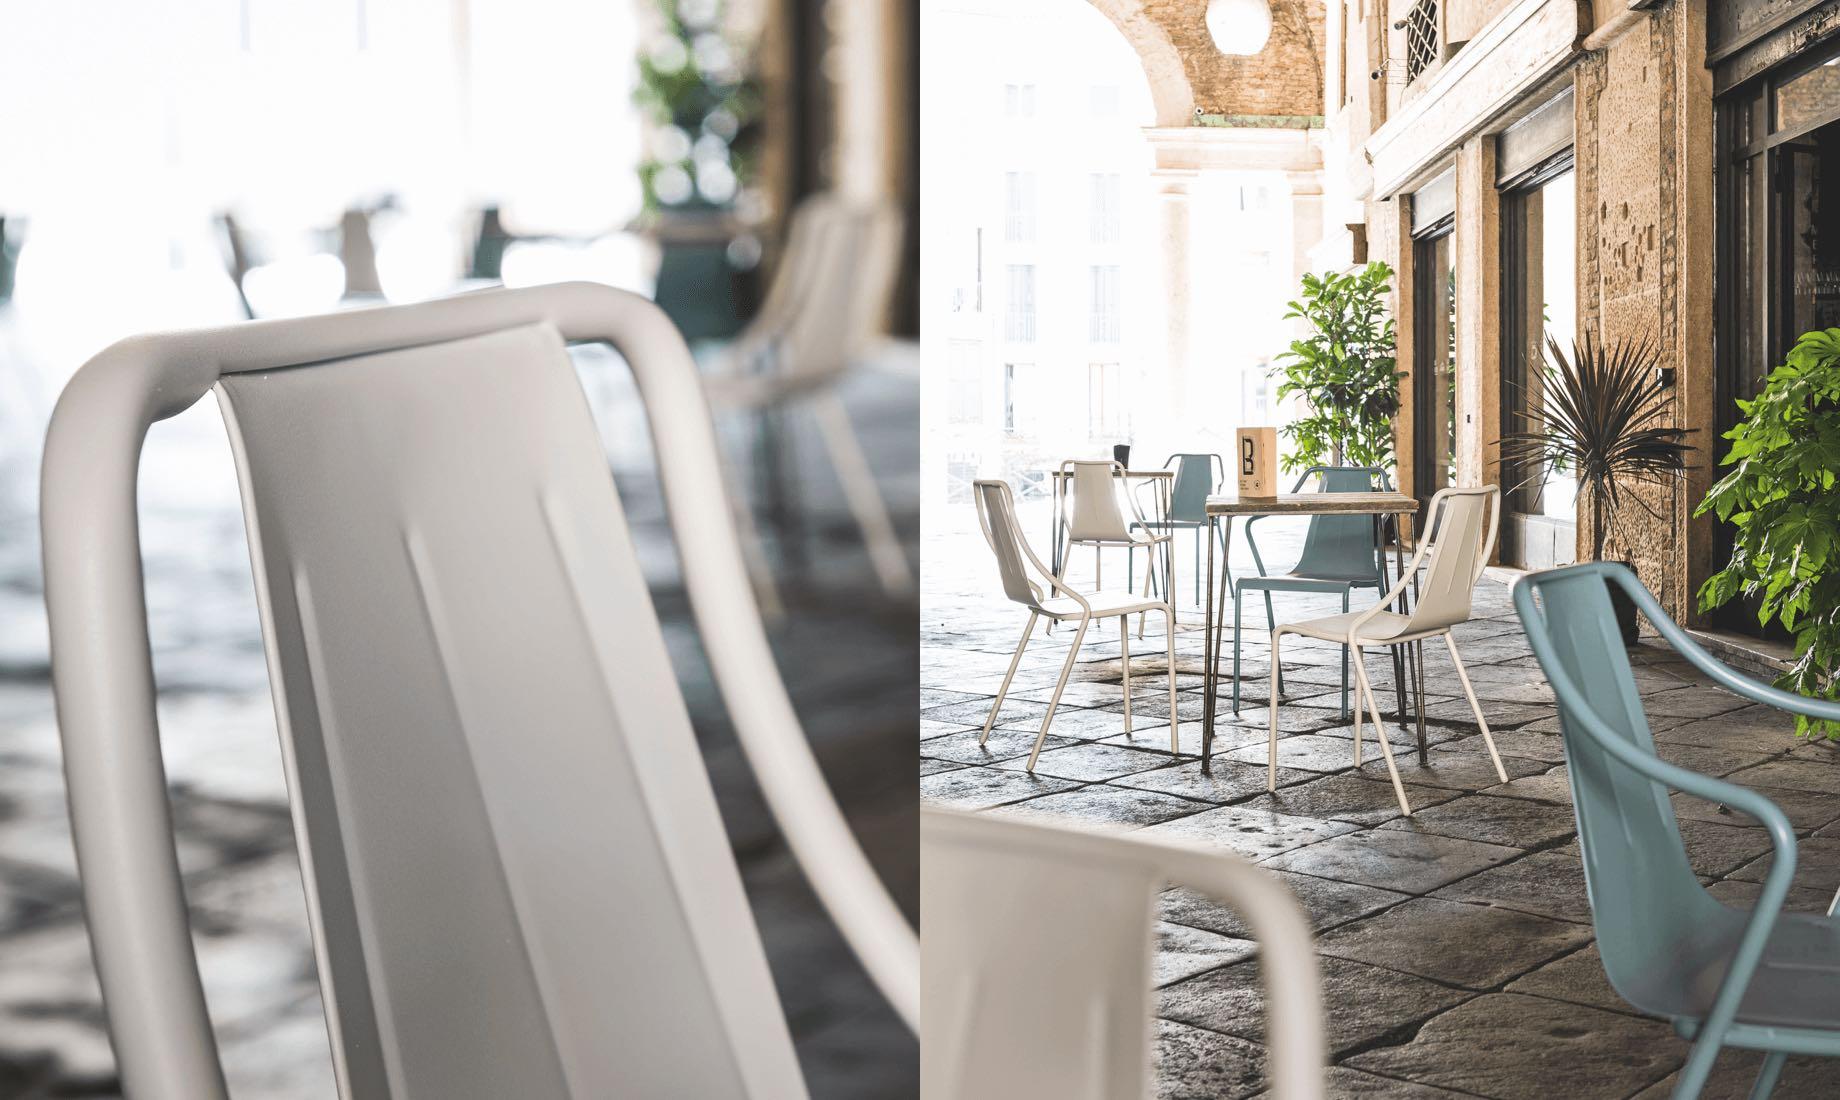 Midj - Ola outdoor designer chairs